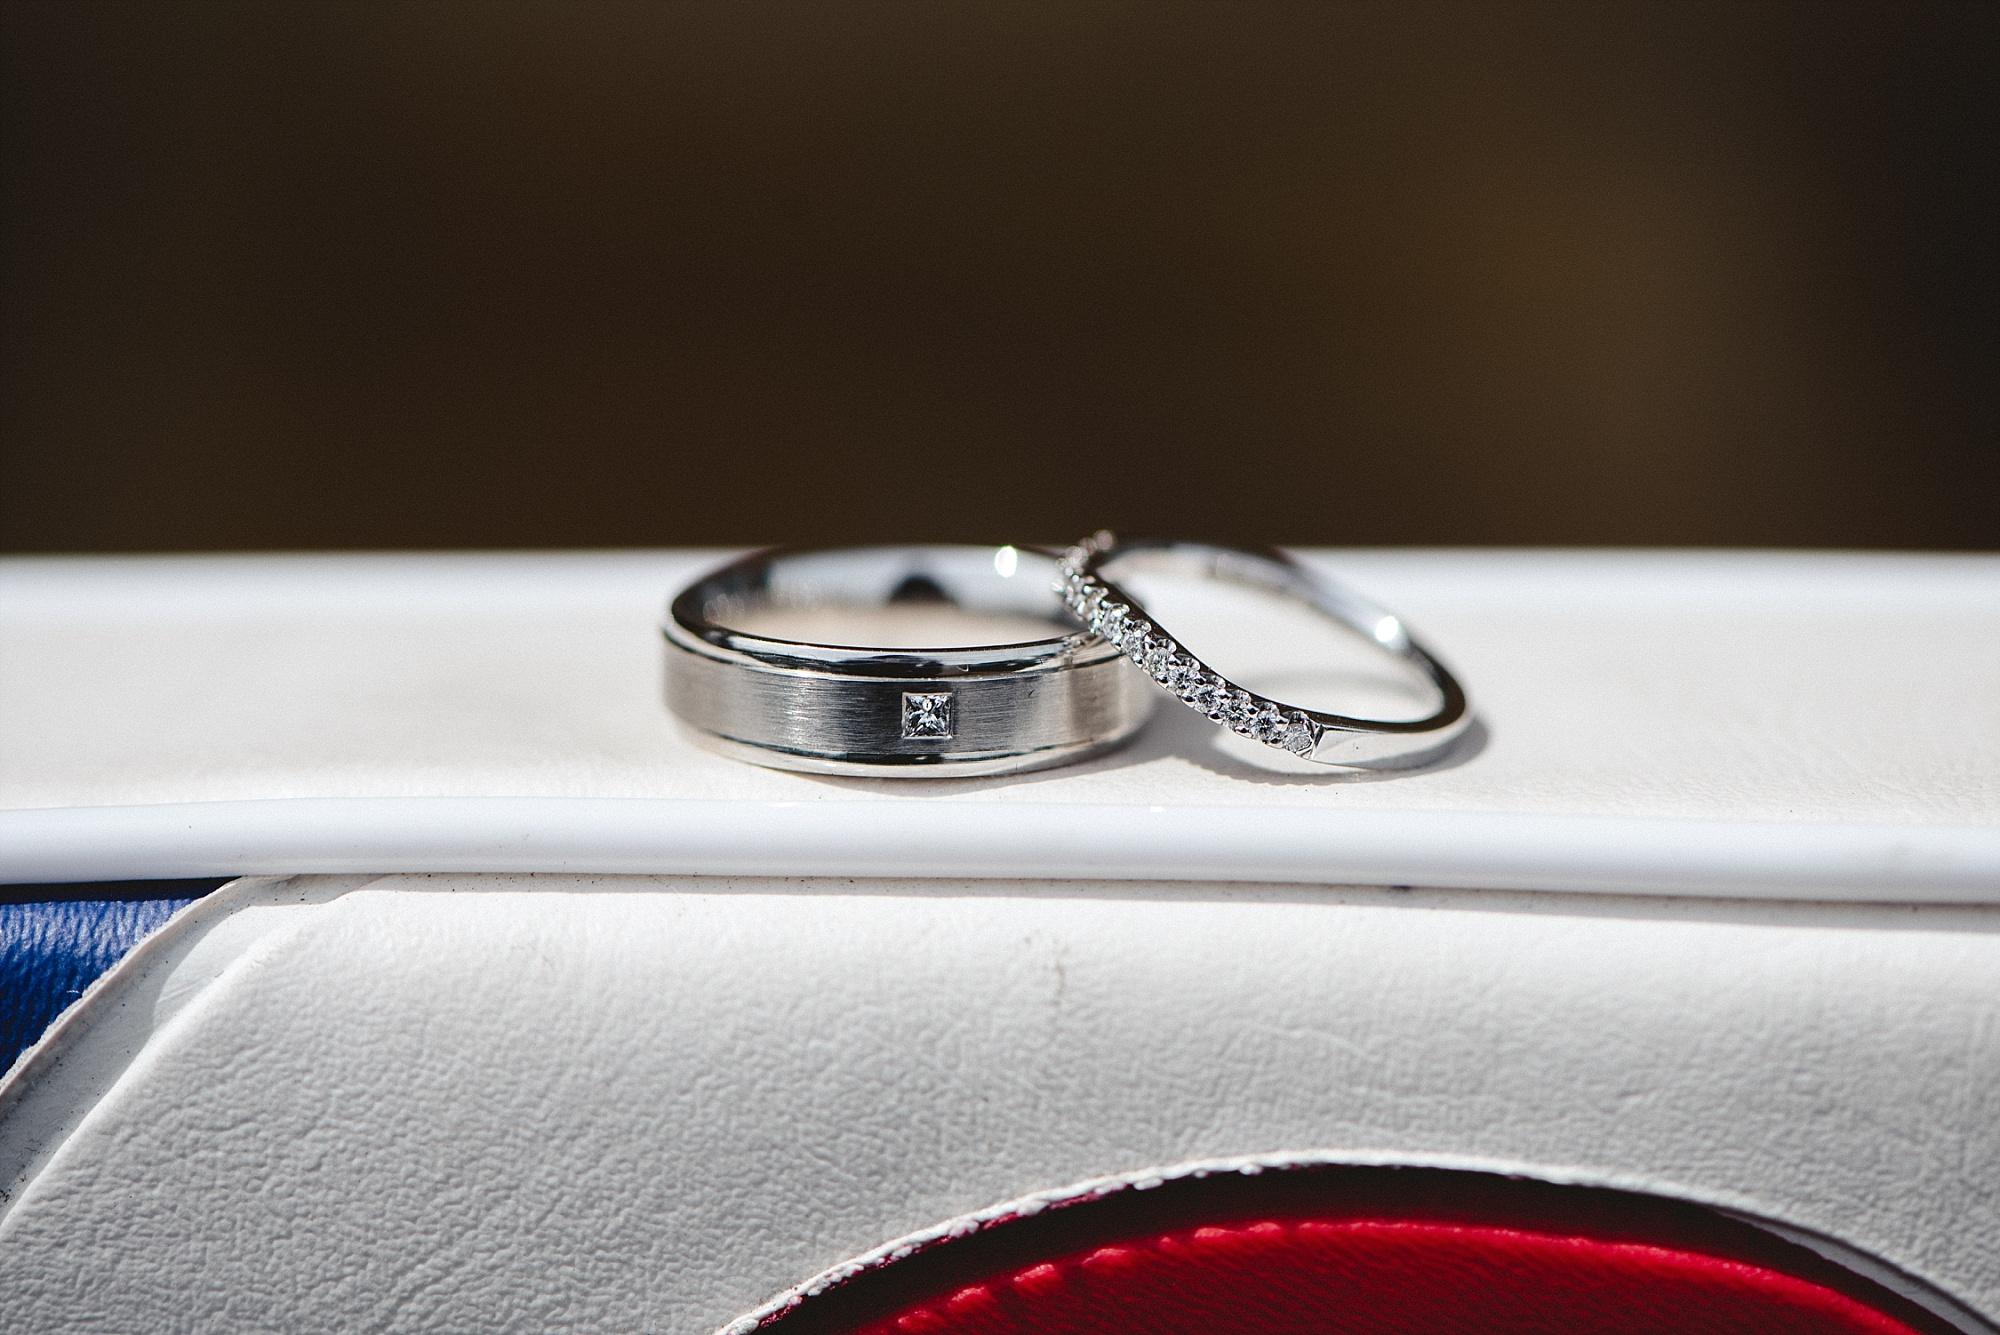 Langtons-Essex-Mod-Themed-Wedding_0005.jpg